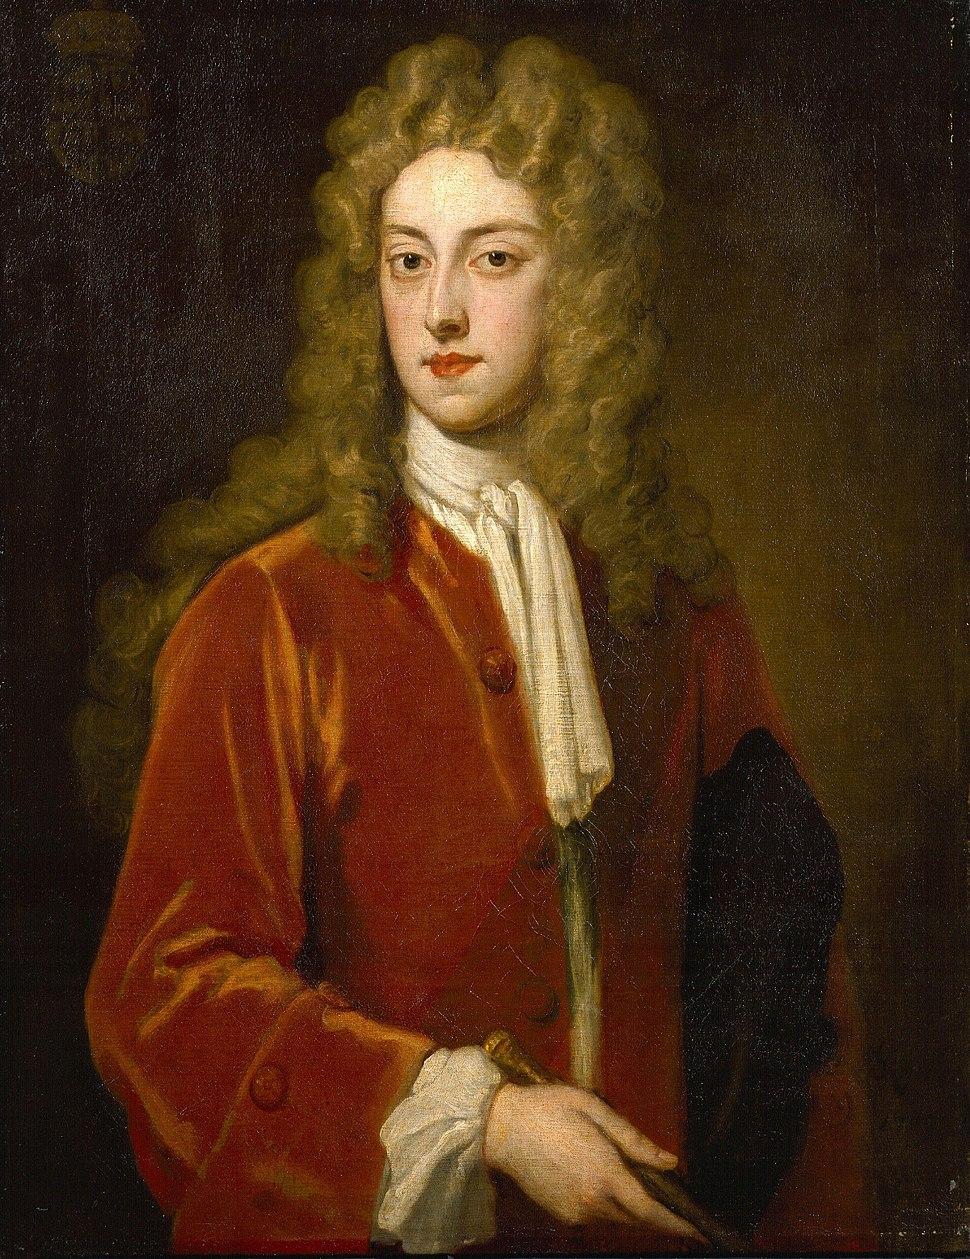 John Montagu, 2nd Duke of Montagu by Sir Godfrey Kneller, Bt